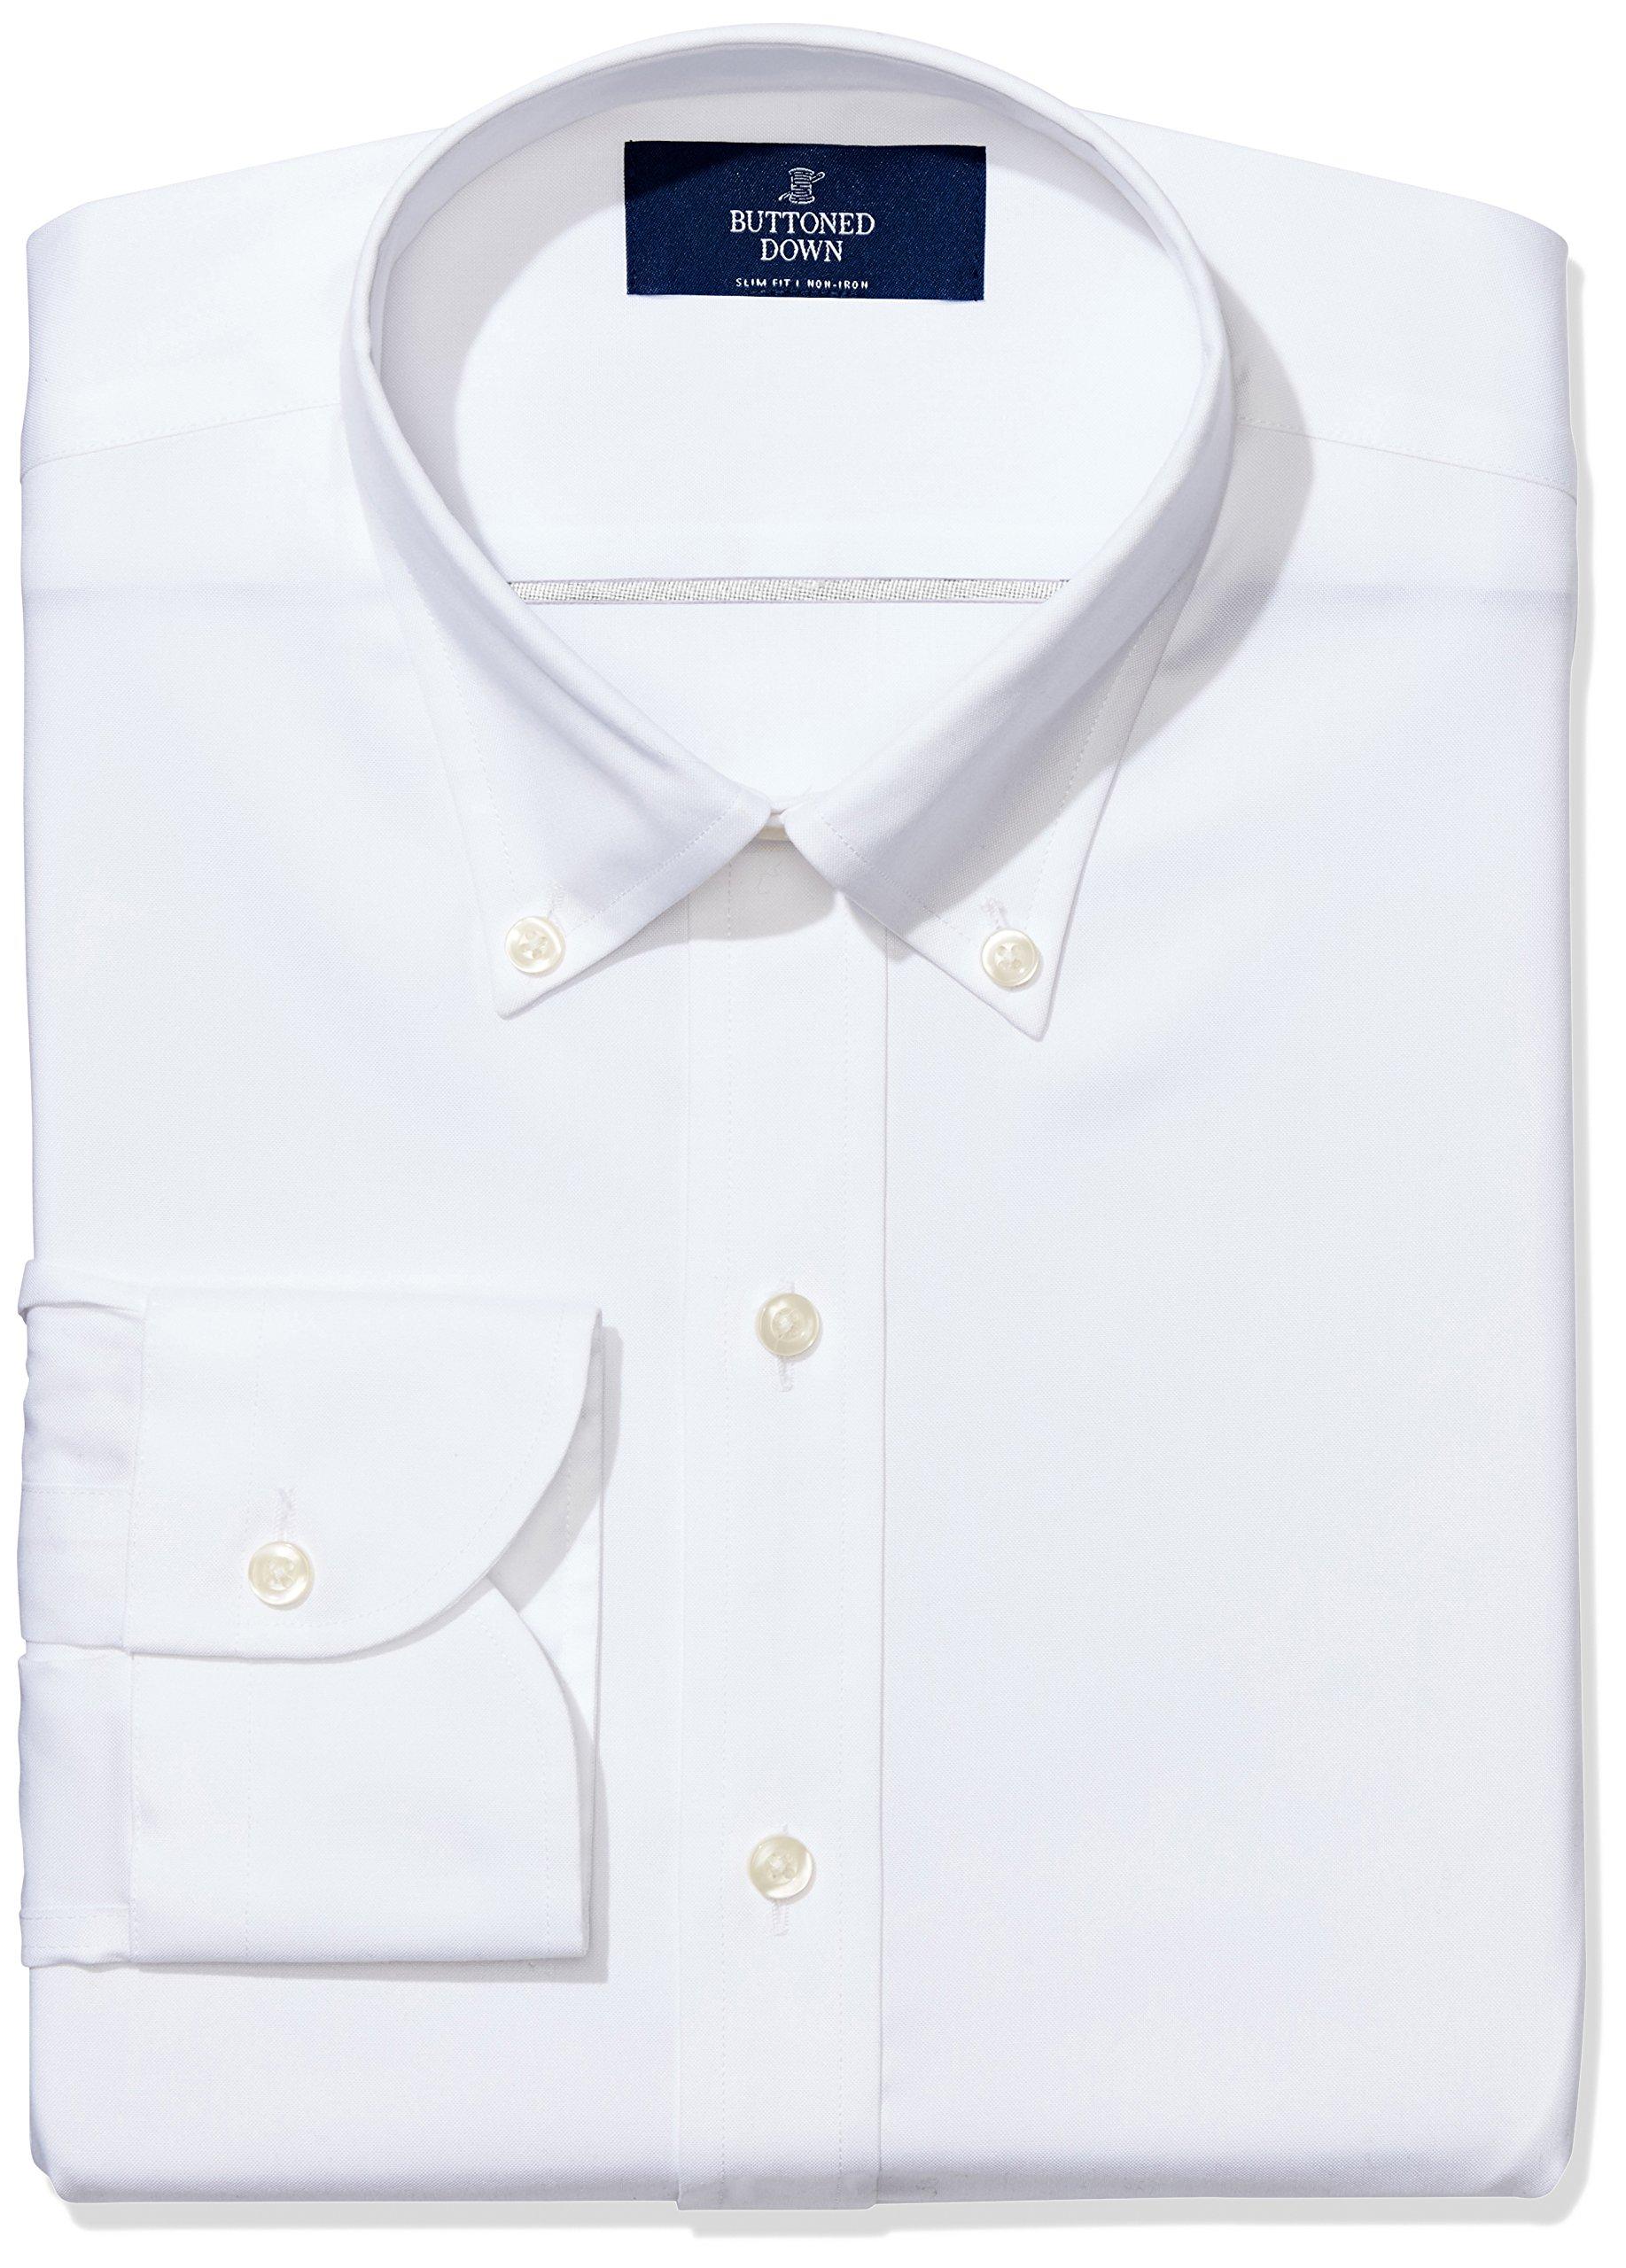 BUTTONED DOWN Men's Slim Fit Button-Collar Non-Iron Dress Shirt (No Pocket), White, 16'' Neck 36'' Sleeve